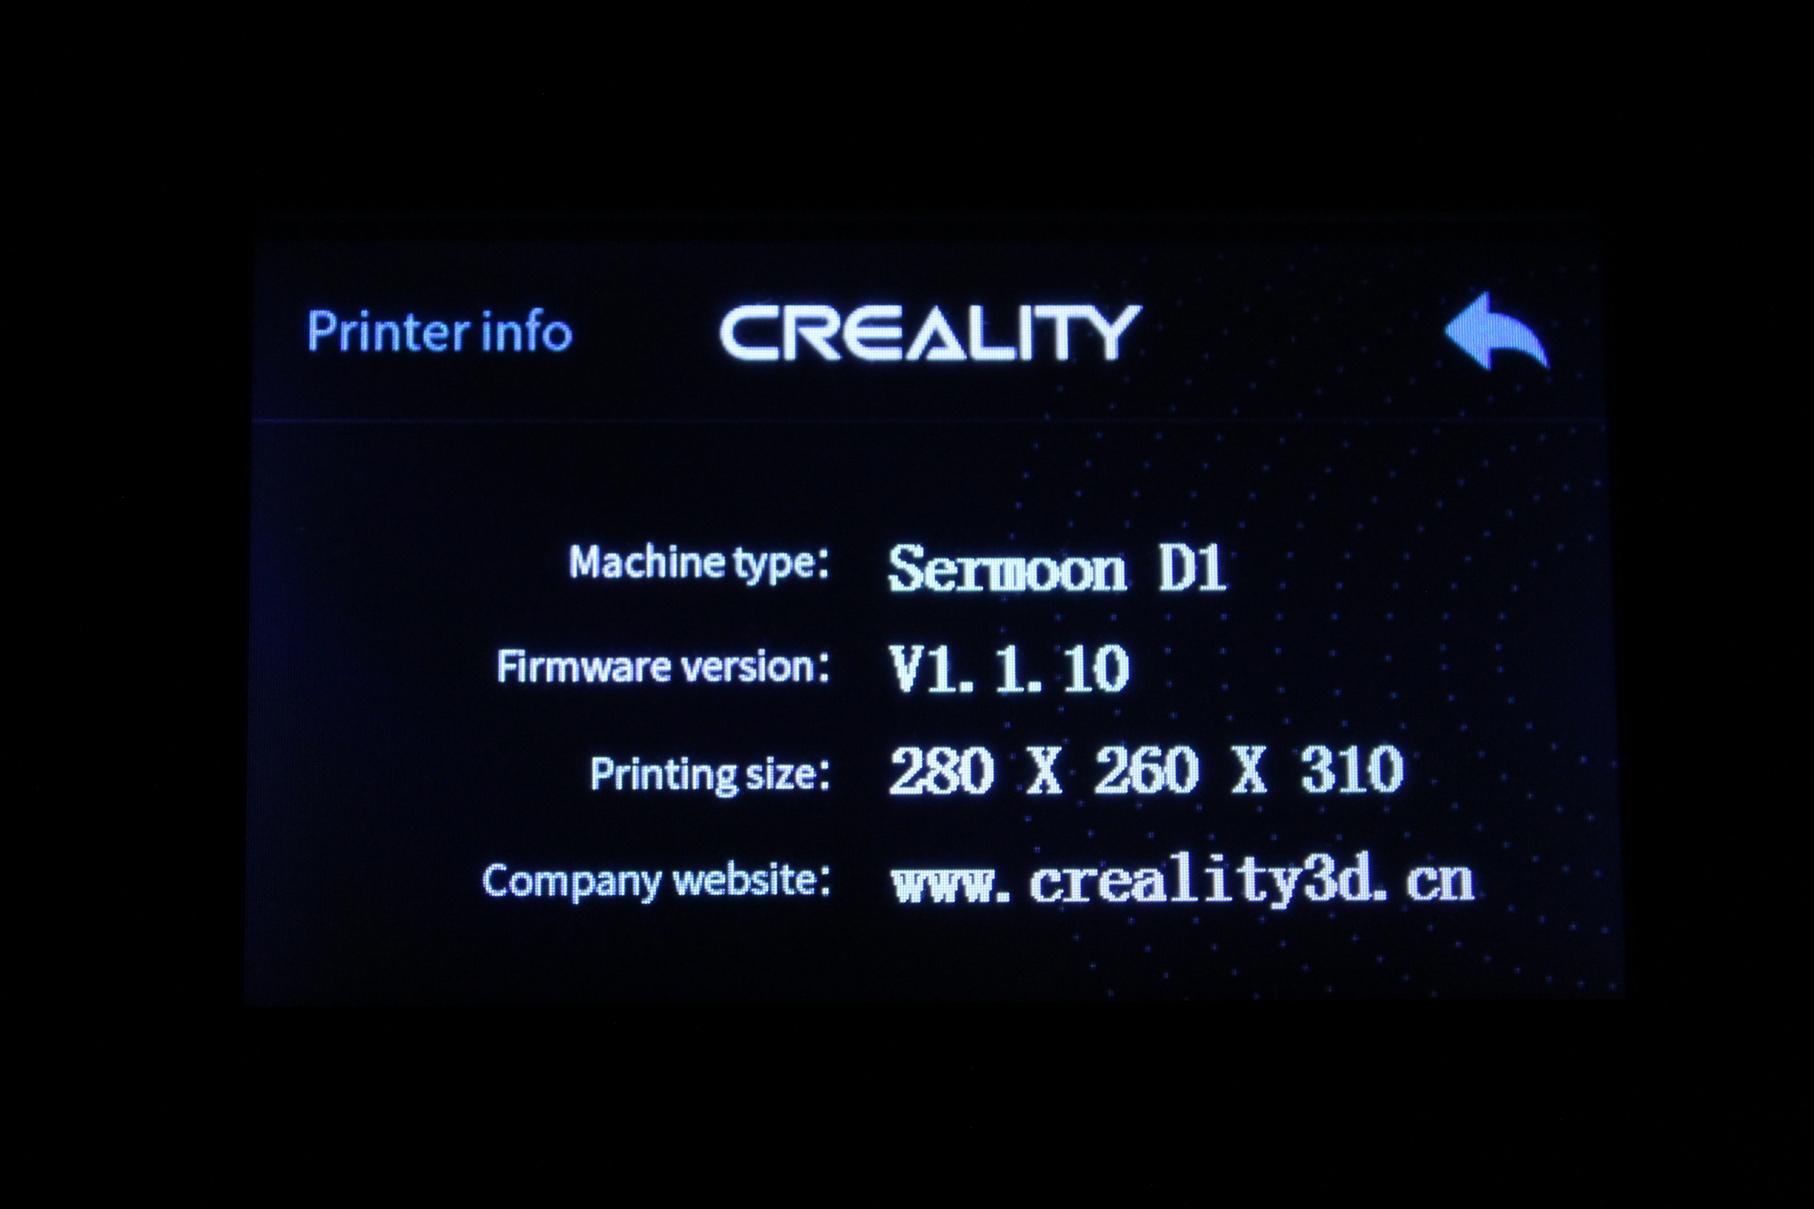 Creality-Sermoon-D1-TFT-Screen-Interface-3